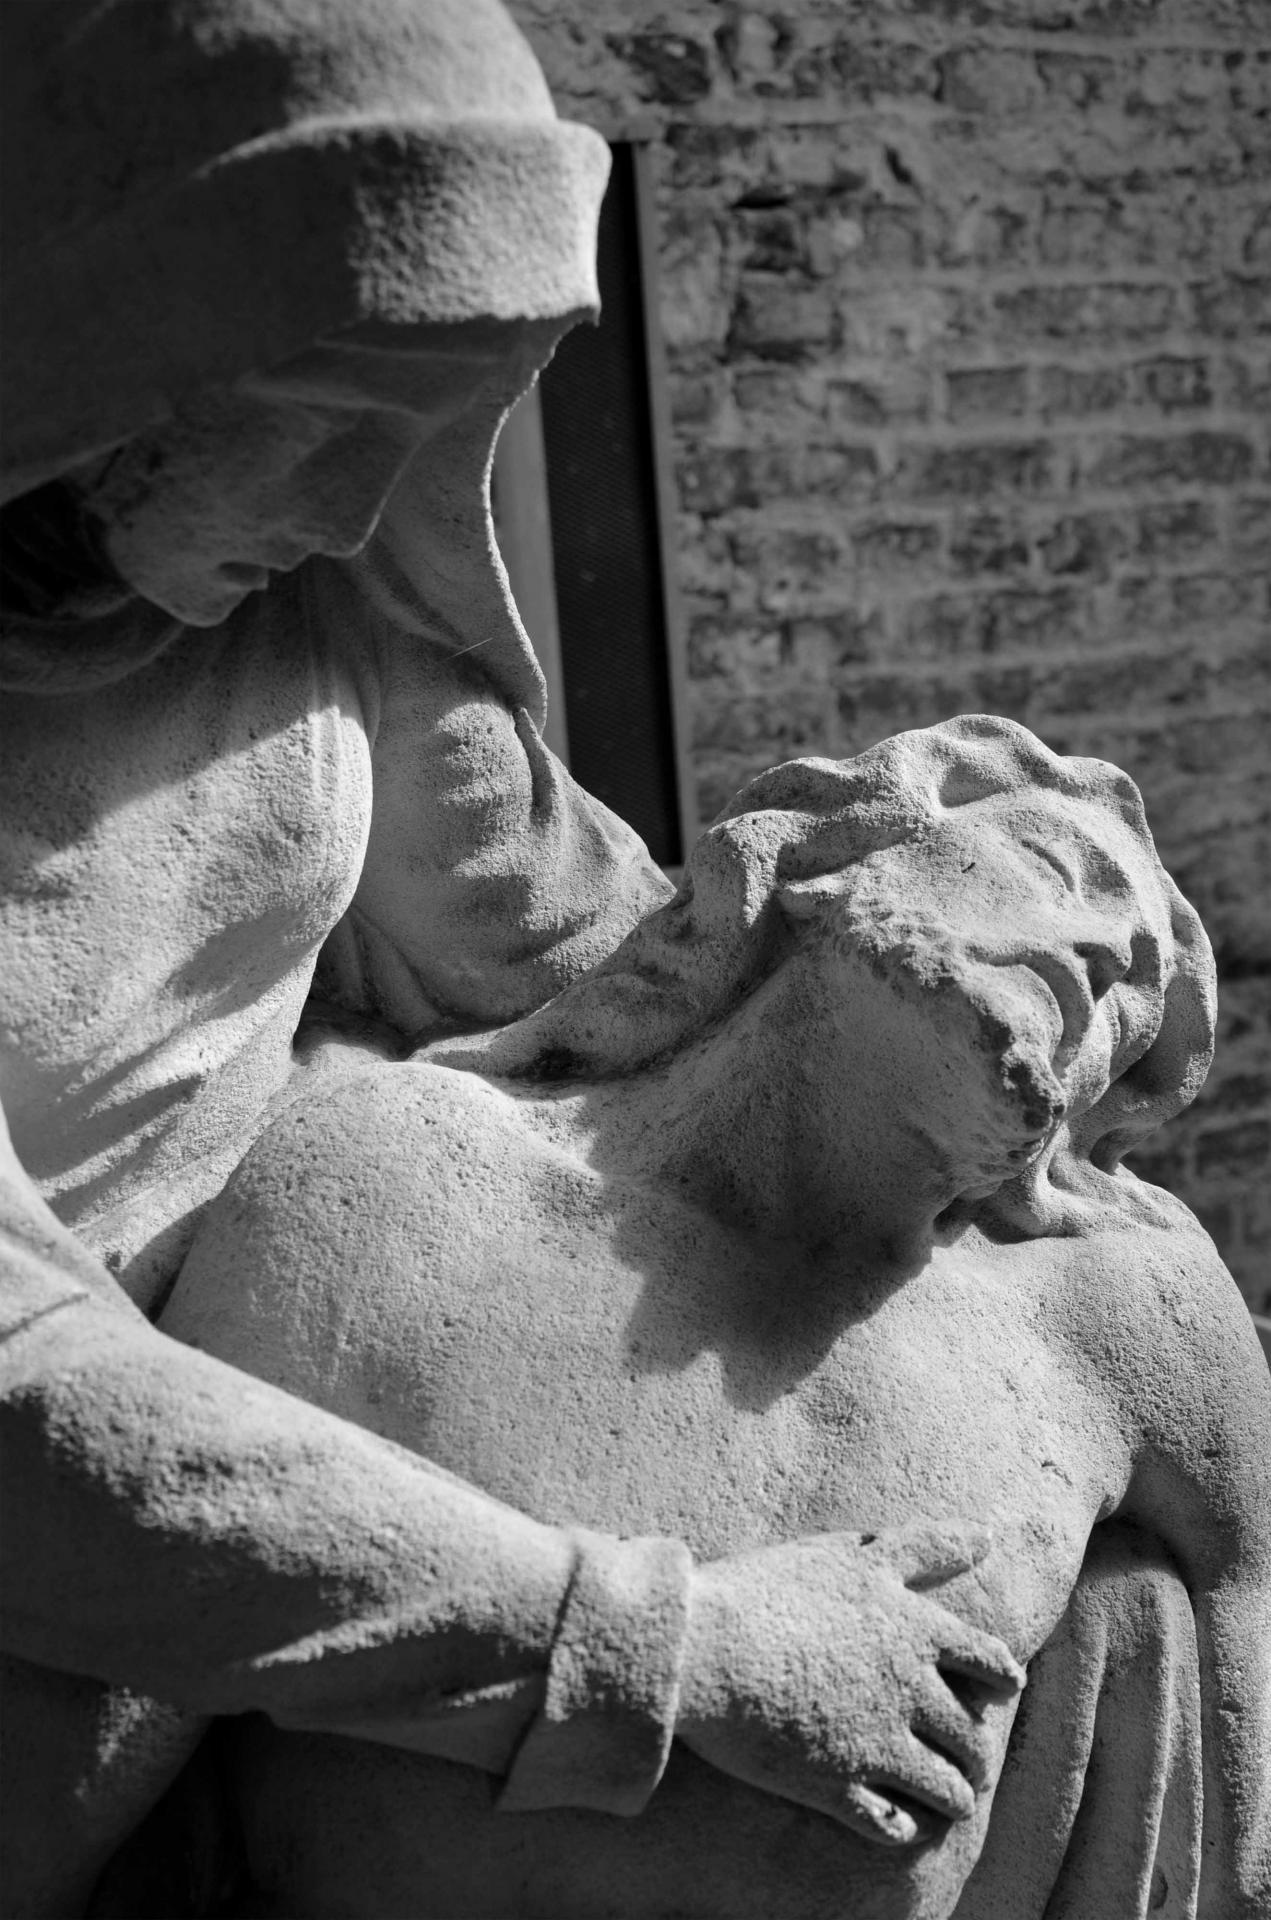 Pieta saint jacques